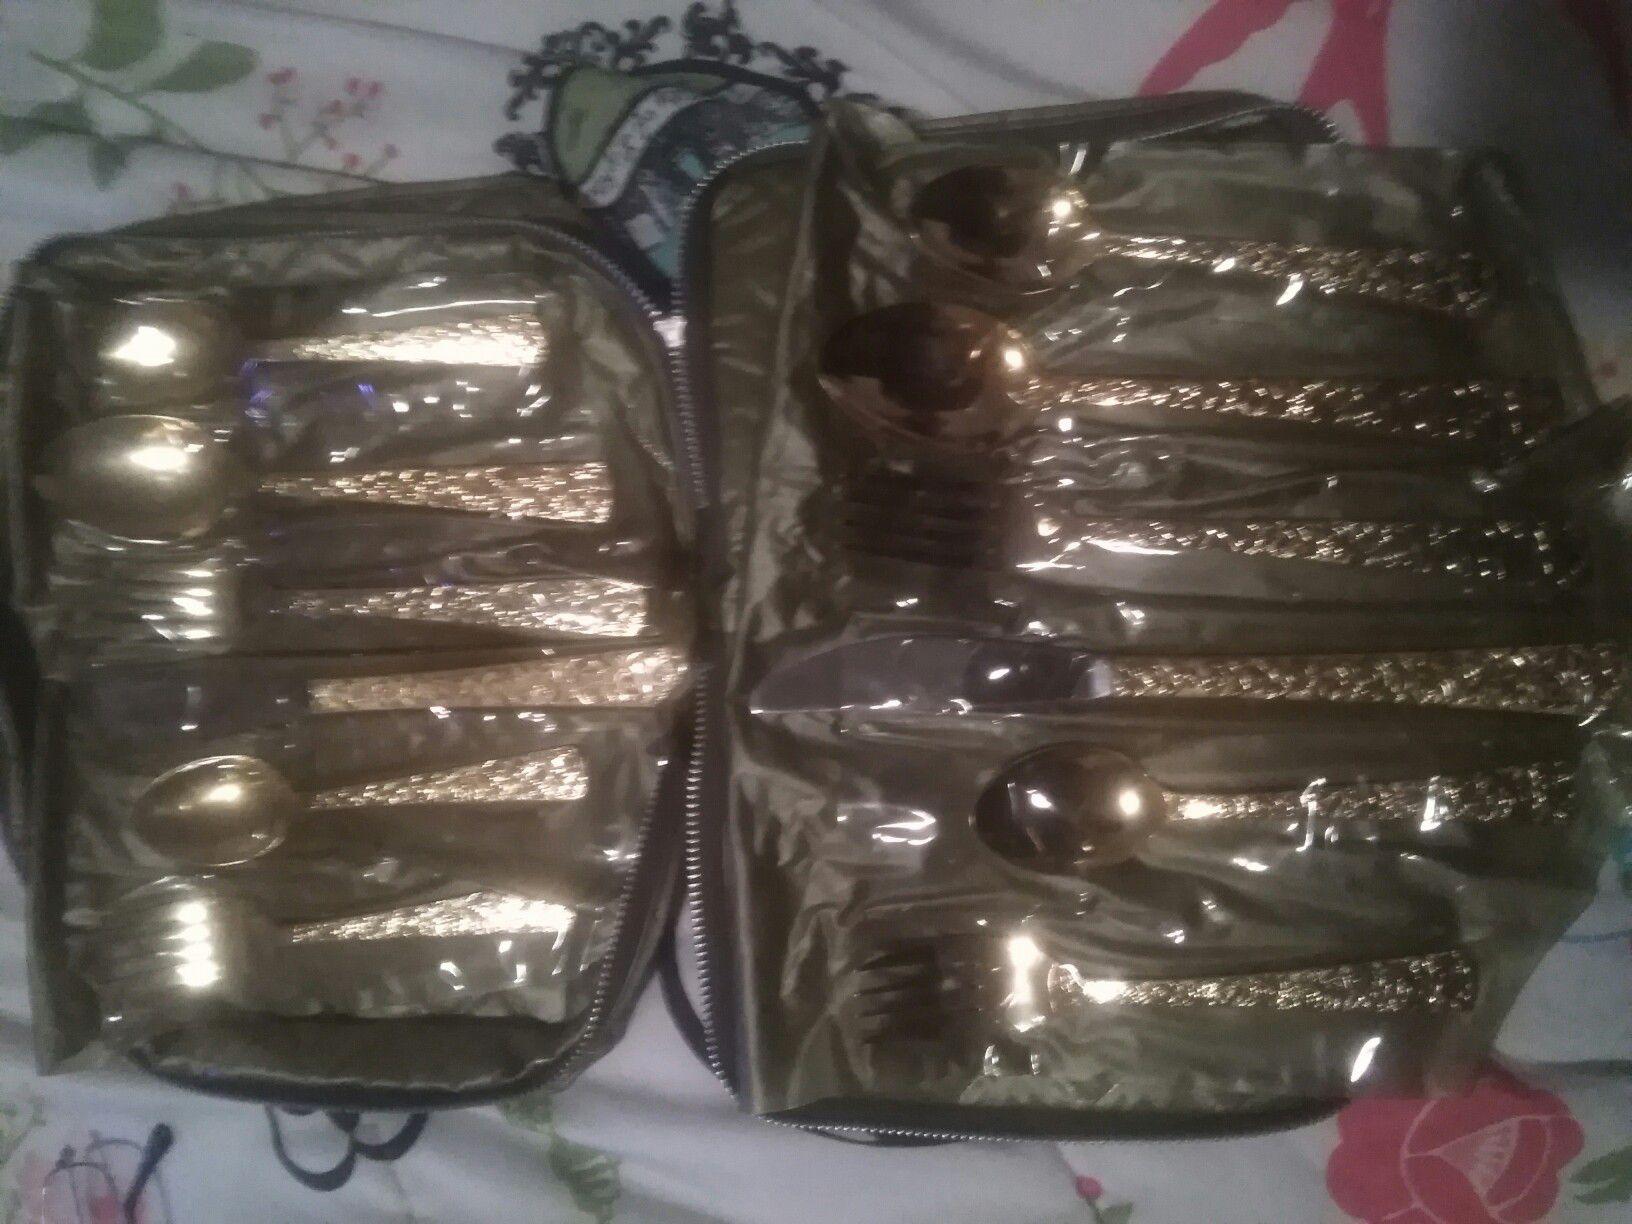 12pc Set Cellini Romanesque Gold ElectroPlate Silverware